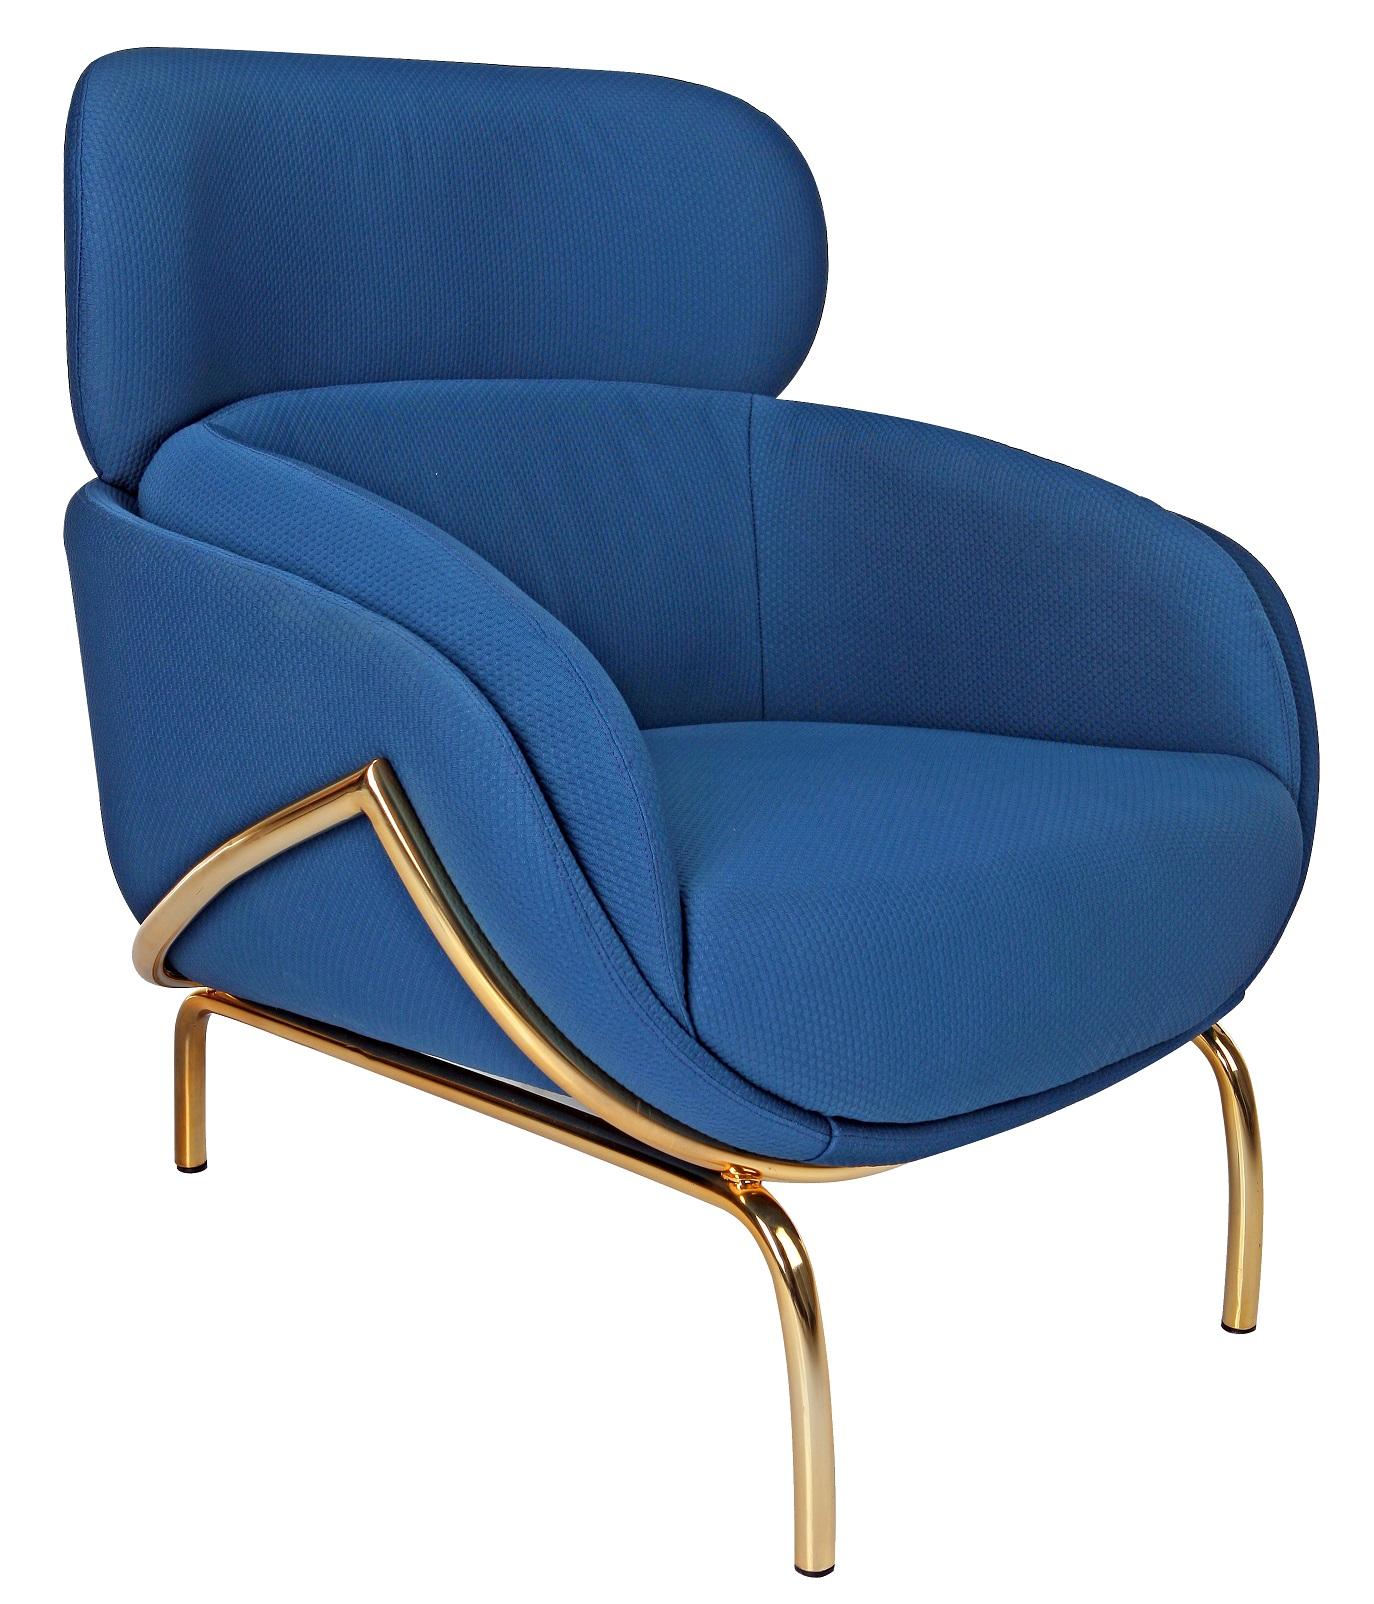 Royal blue loungestol